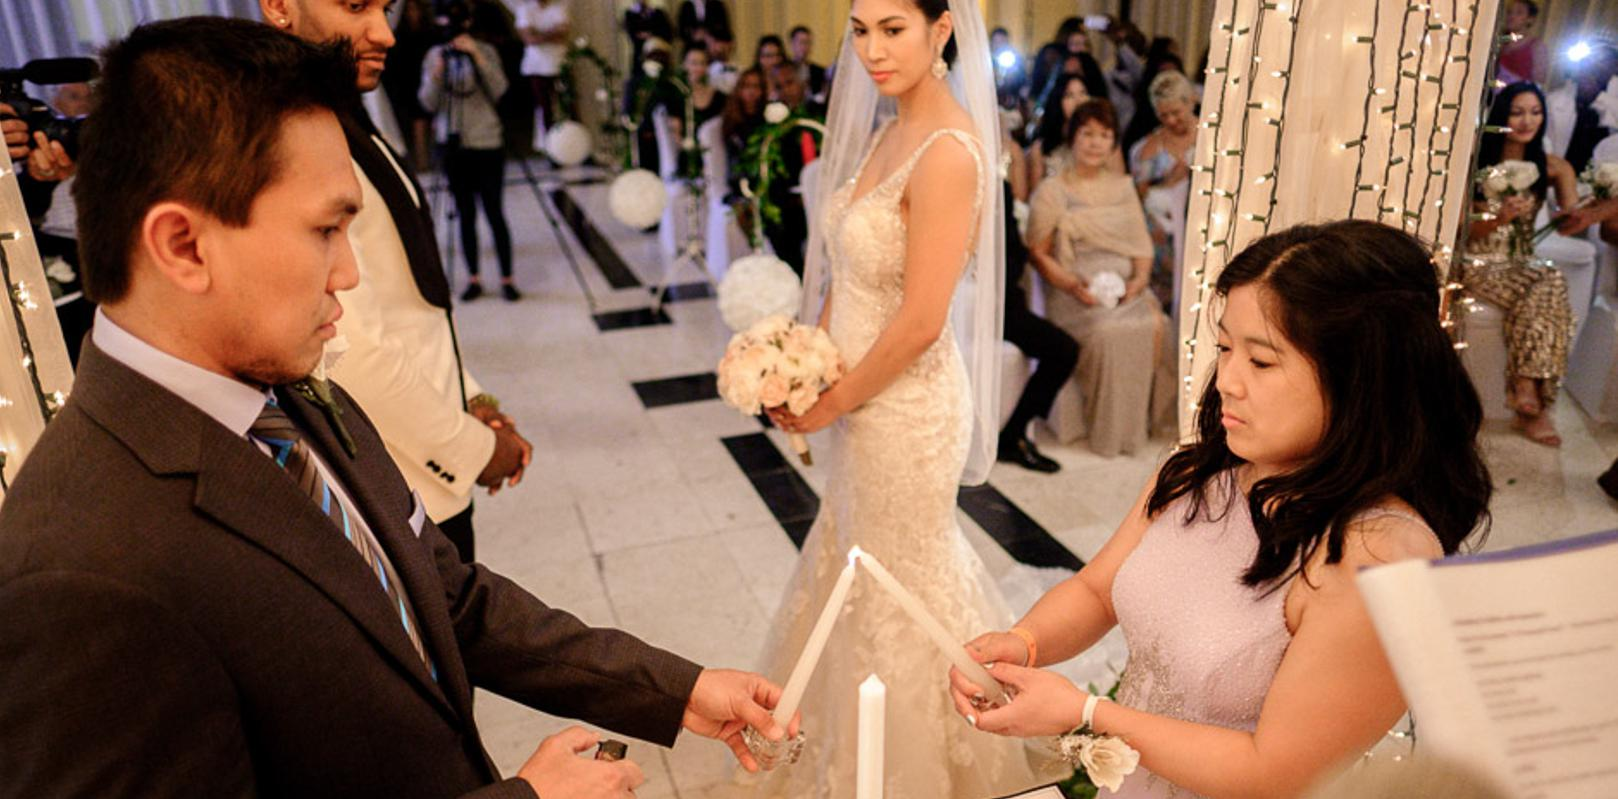 bodas-sin-clasificar-sin-tema-cuba-41361.jpg